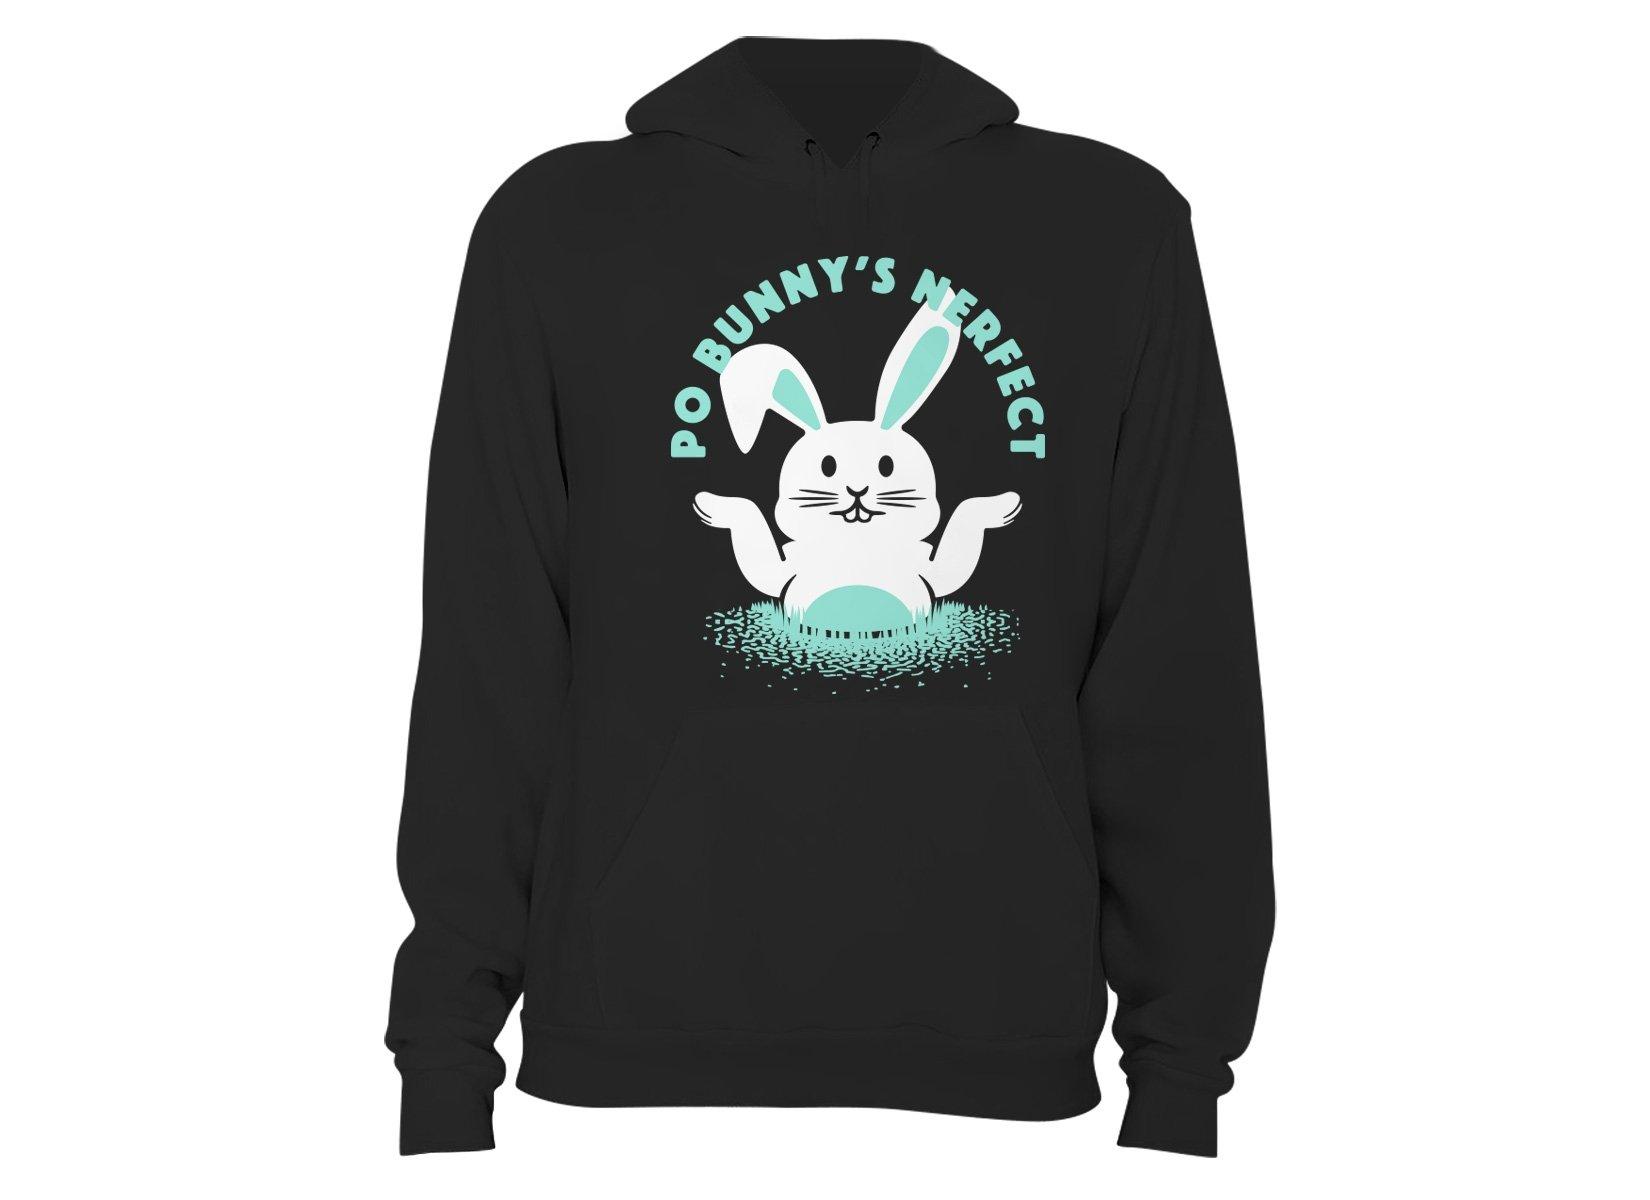 Po Bunny's Nerfect on Hoodie